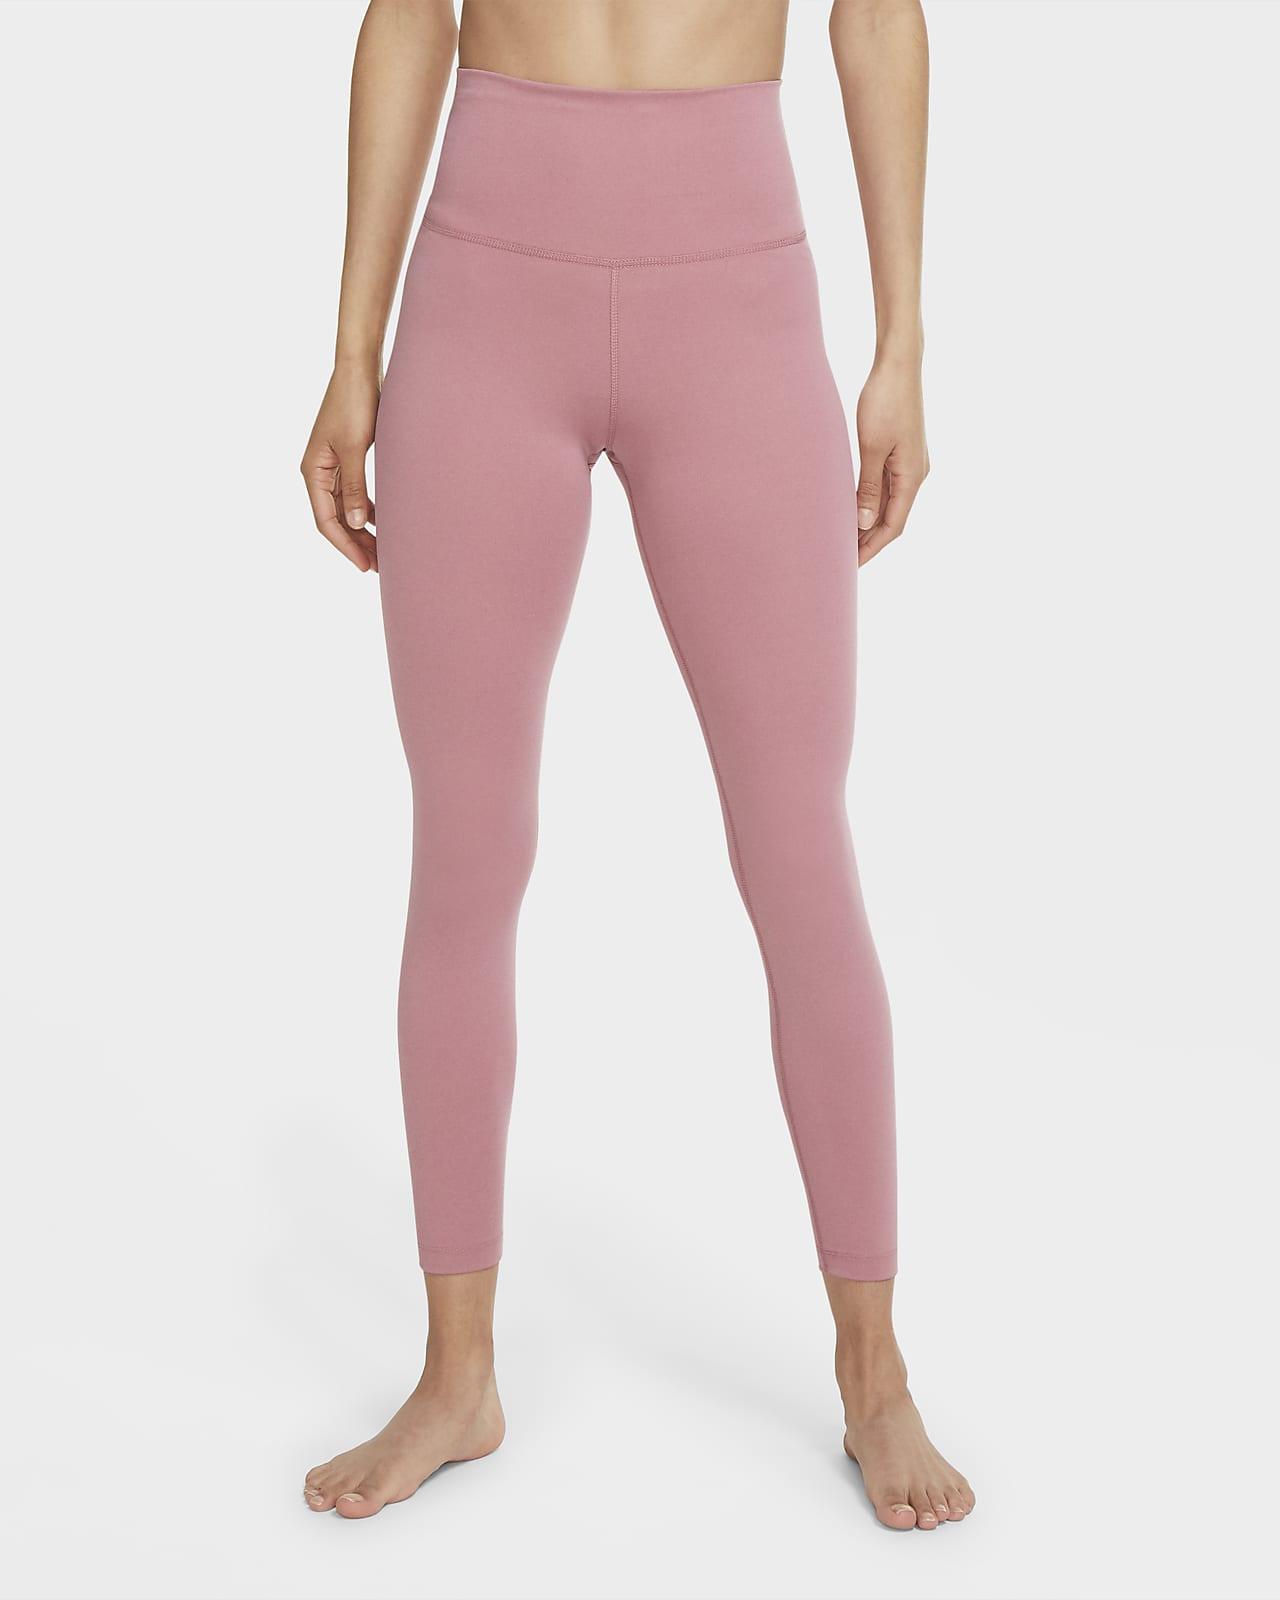 Tights a 7/8 Nike Yoga para mulher